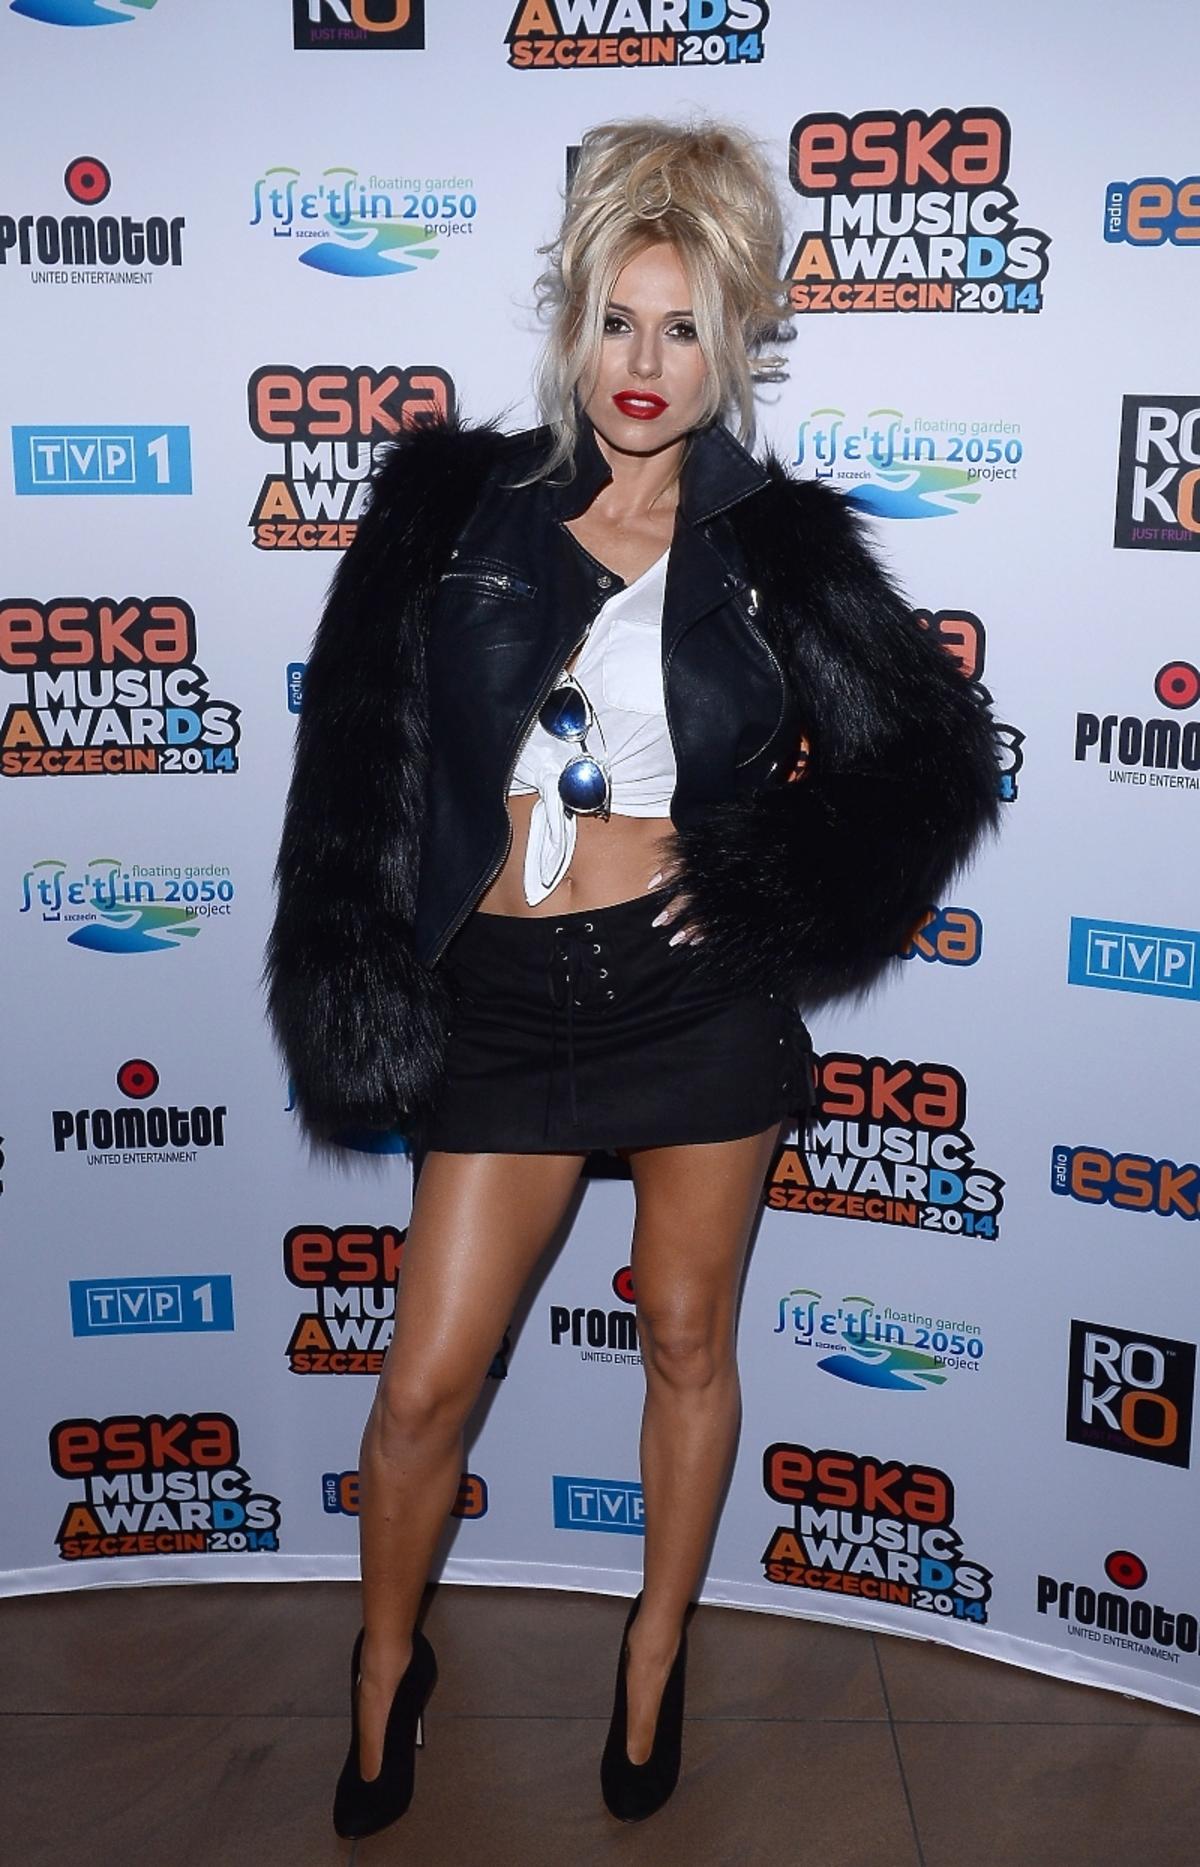 Doda na Eska Music Awards 2014